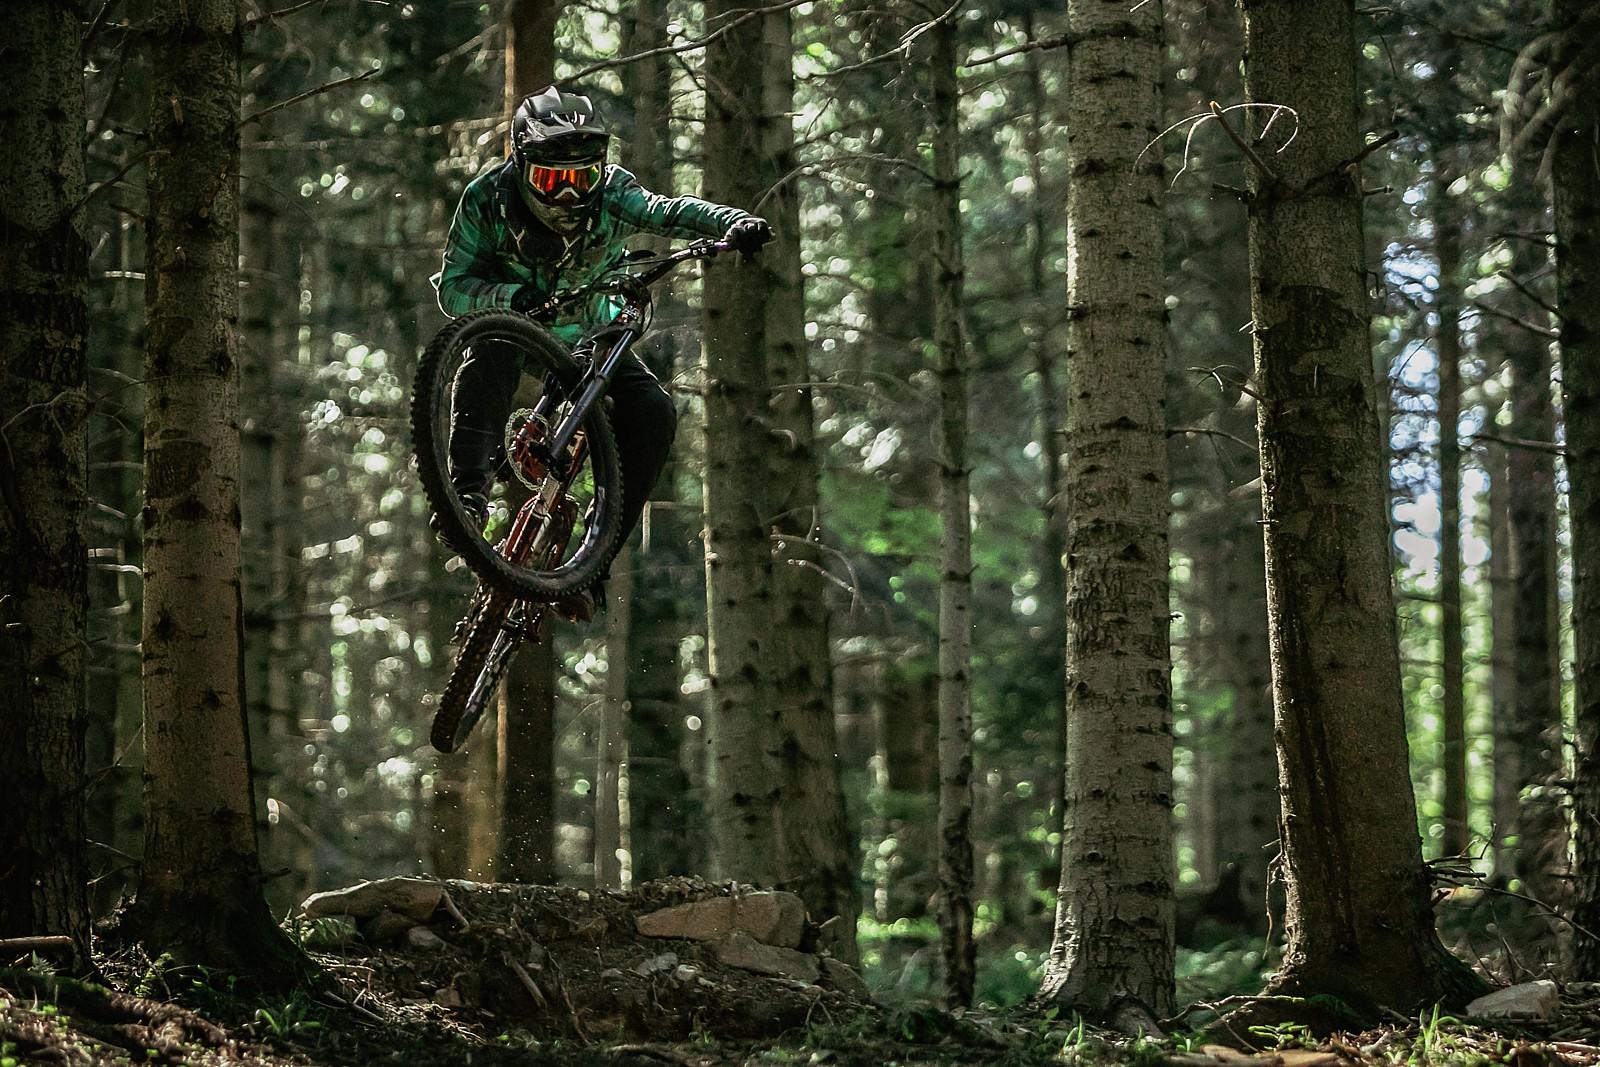 natural - Banan - Mountain Biking Pictures - Vital MTB